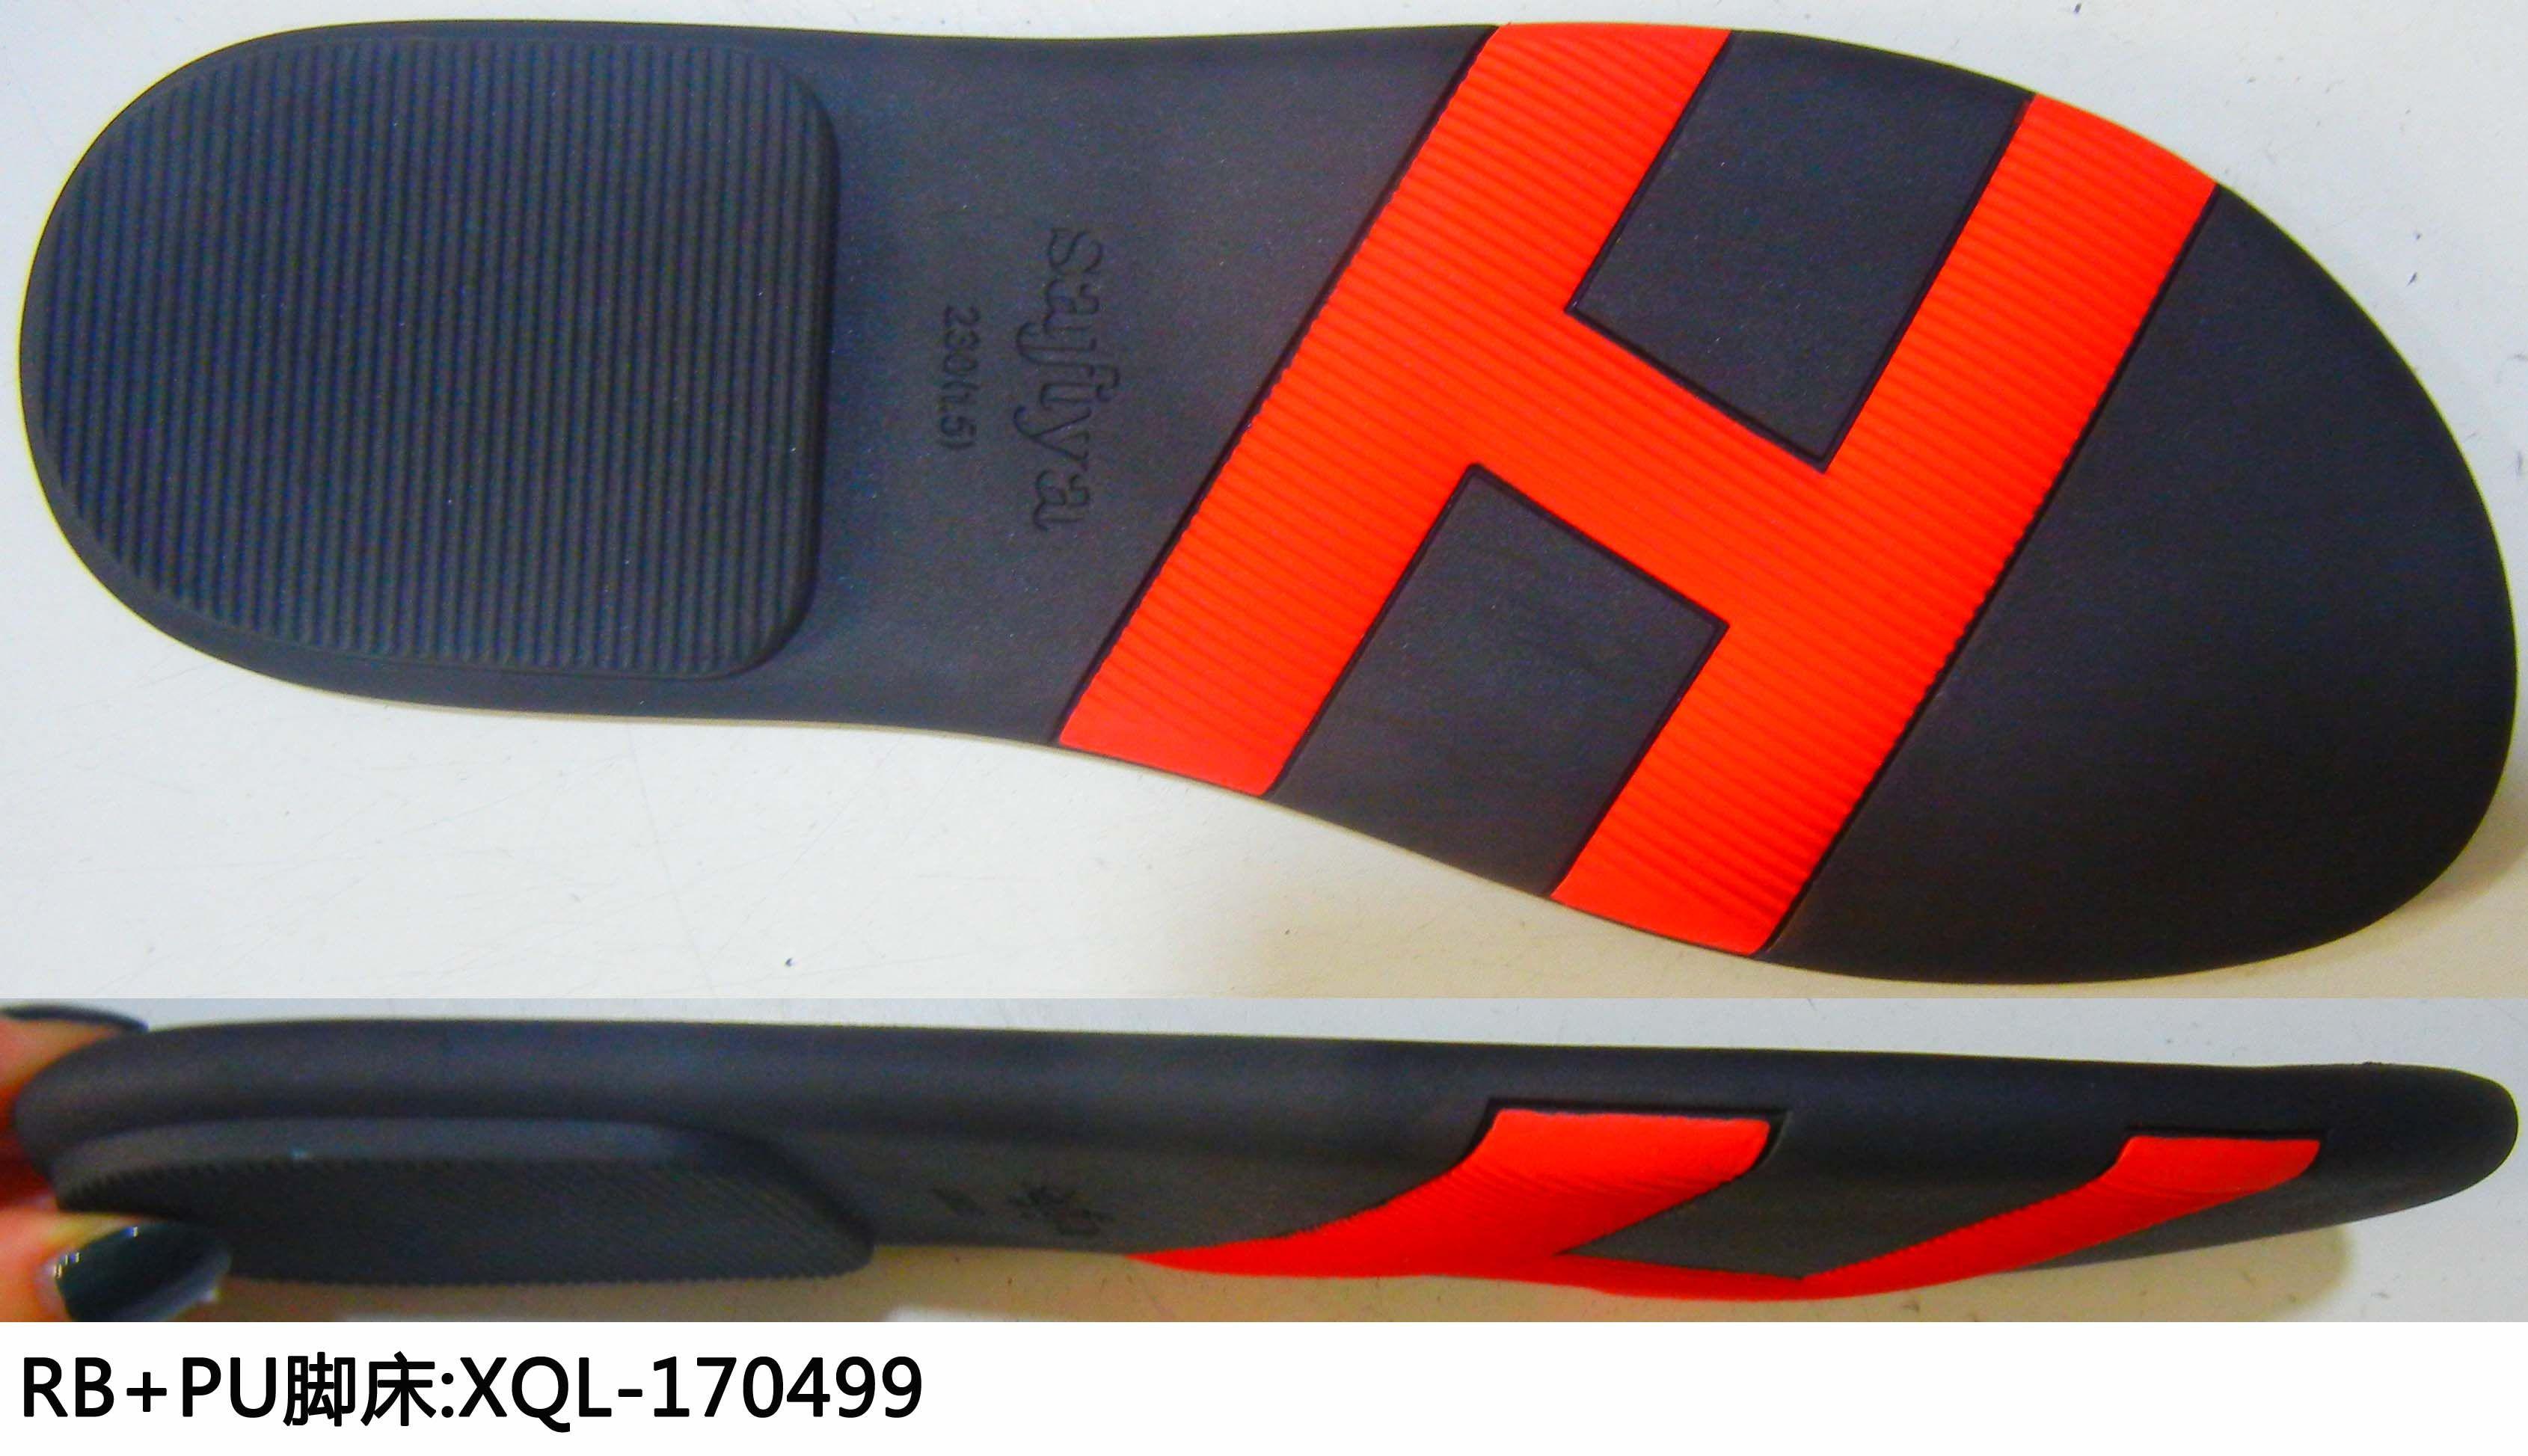 High Density Rubber Shoe Sole Sheet Rubber Shoes Black Sports Shoes Rubber